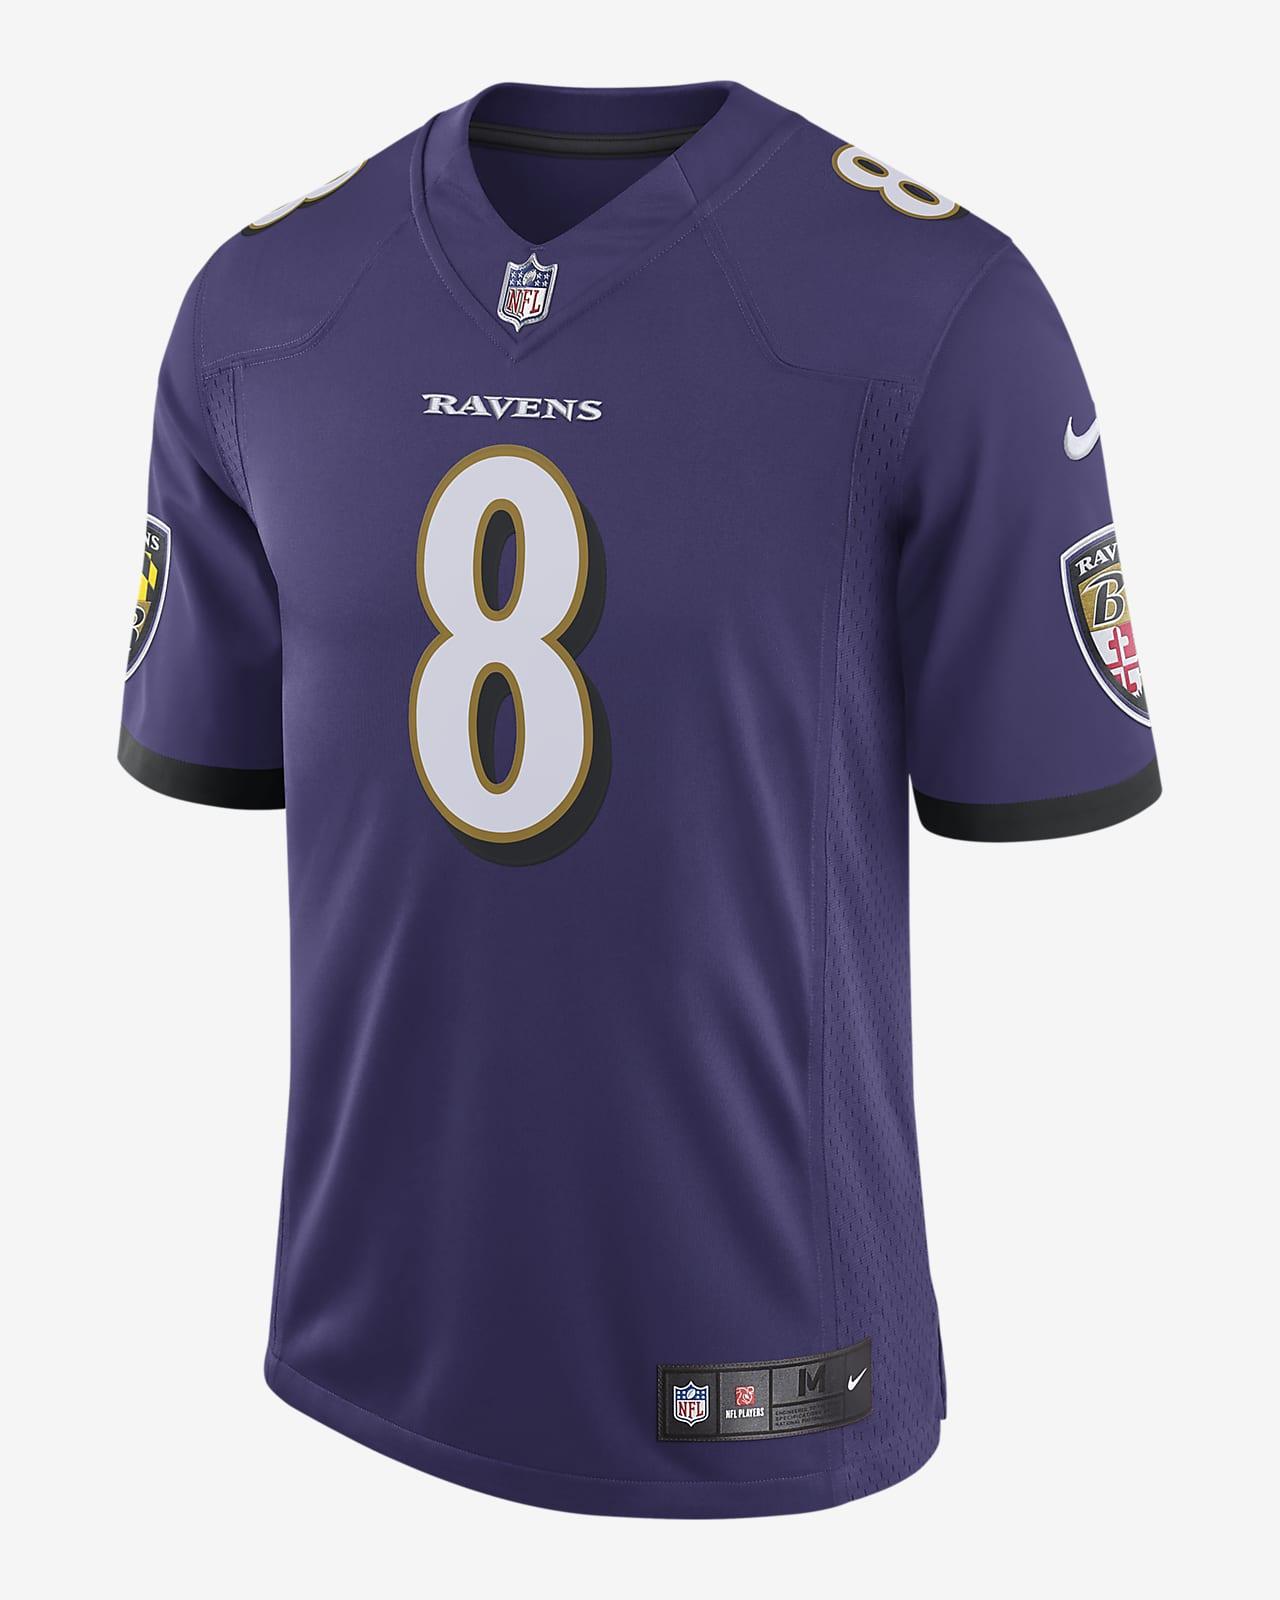 plus size ravens jersey